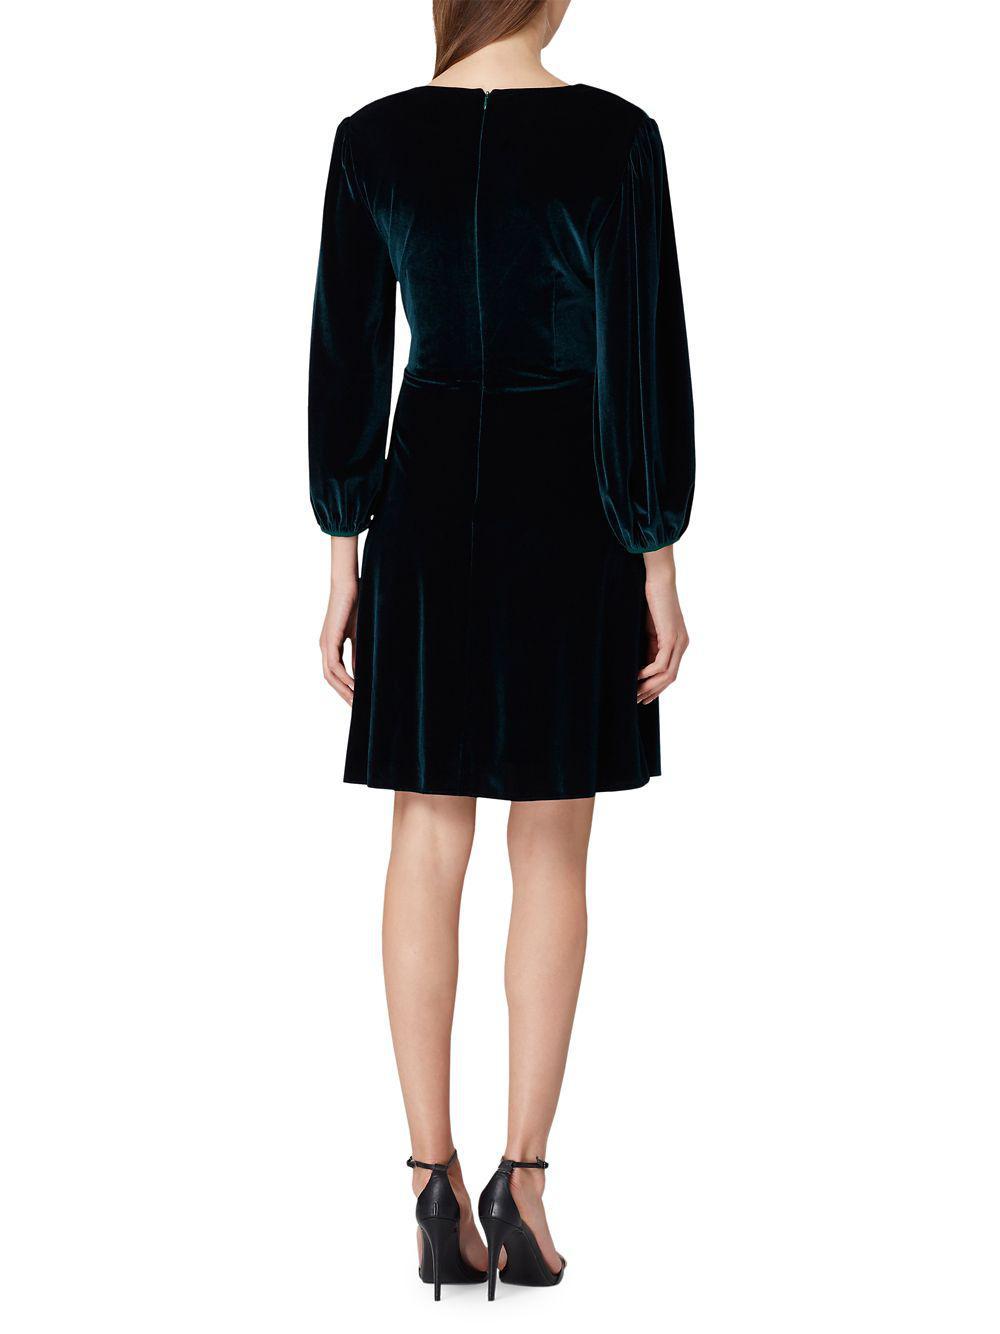 049c816f Tahari - Black Stretch Velvet Faux-wrap Dress - Lyst. View fullscreen